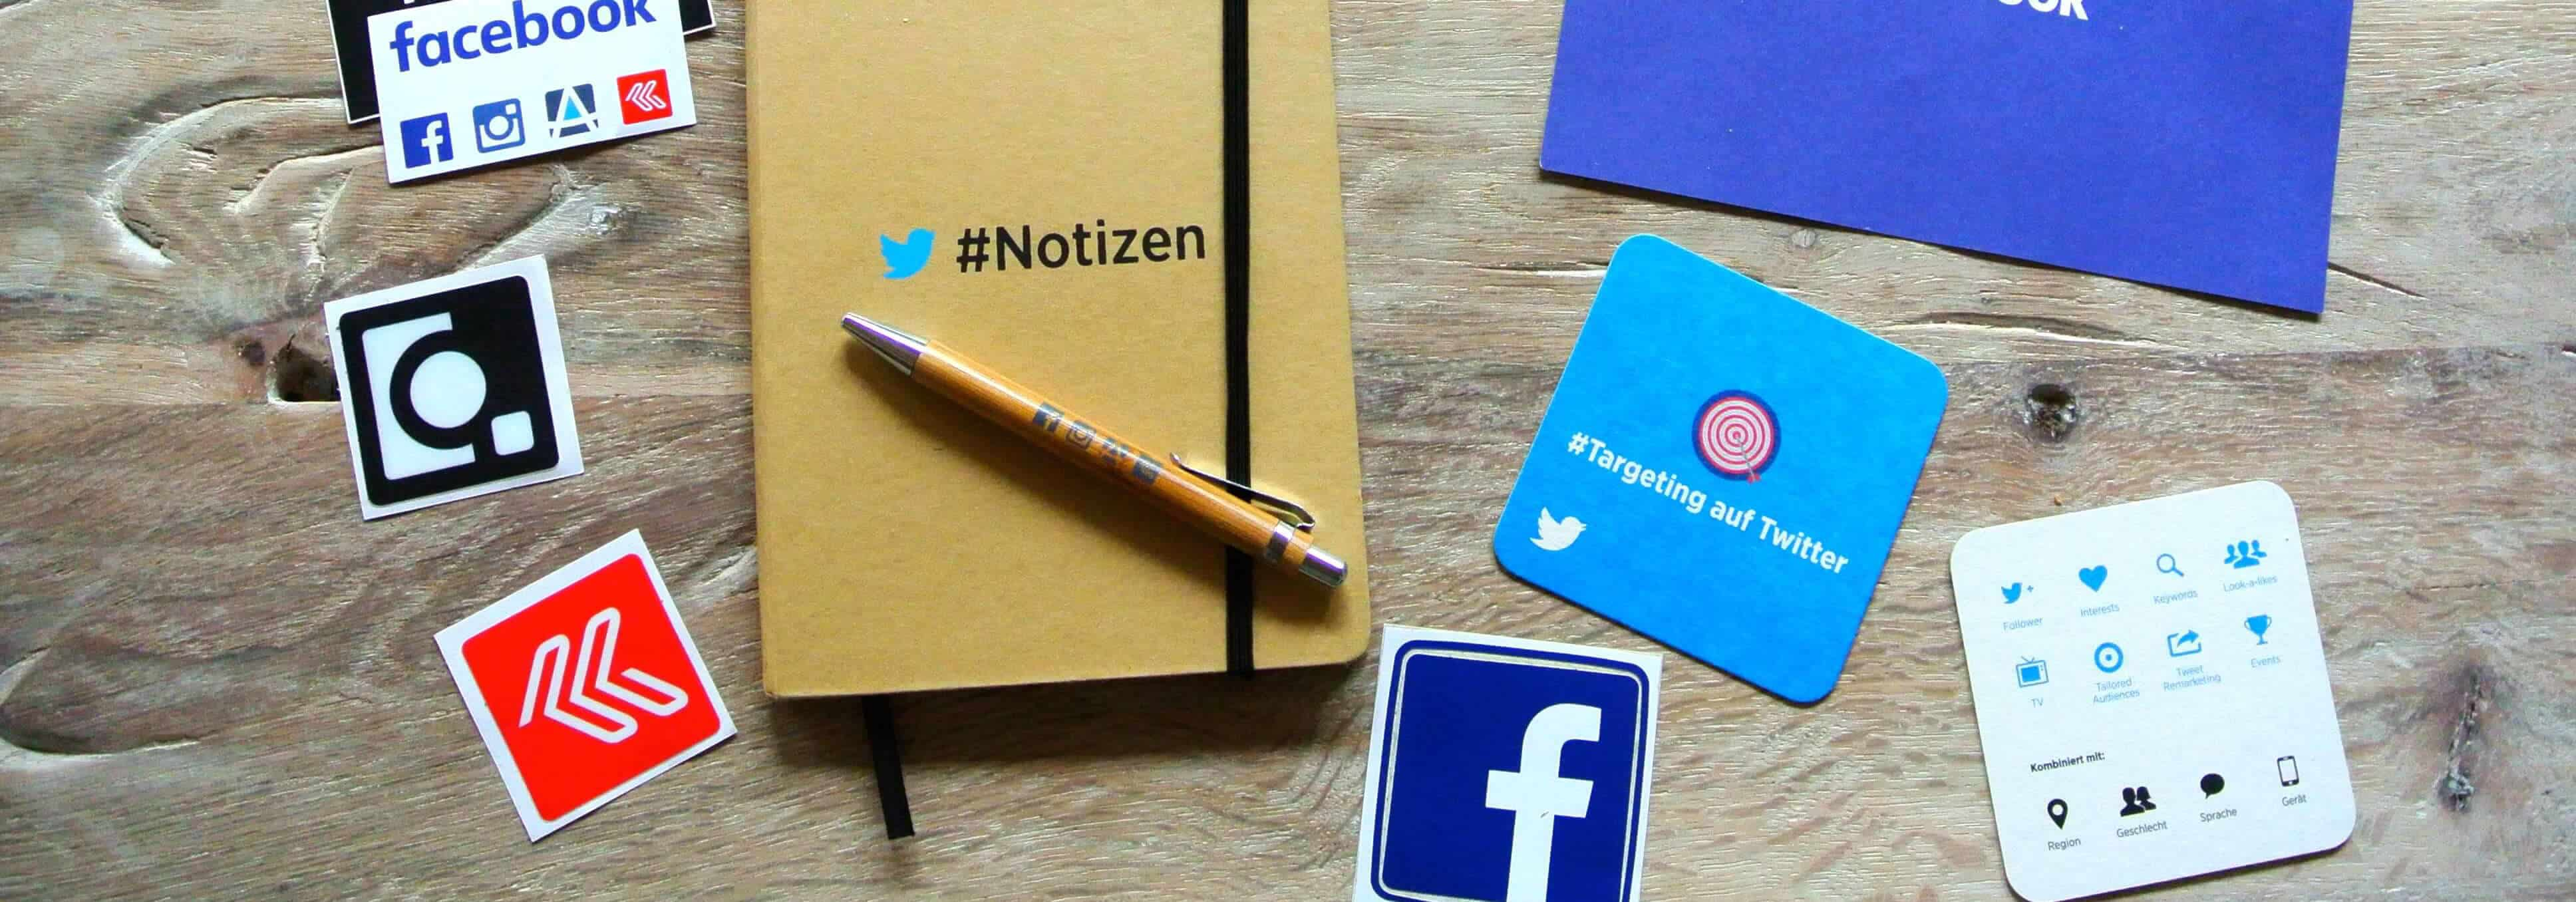 Organizing your social media apps